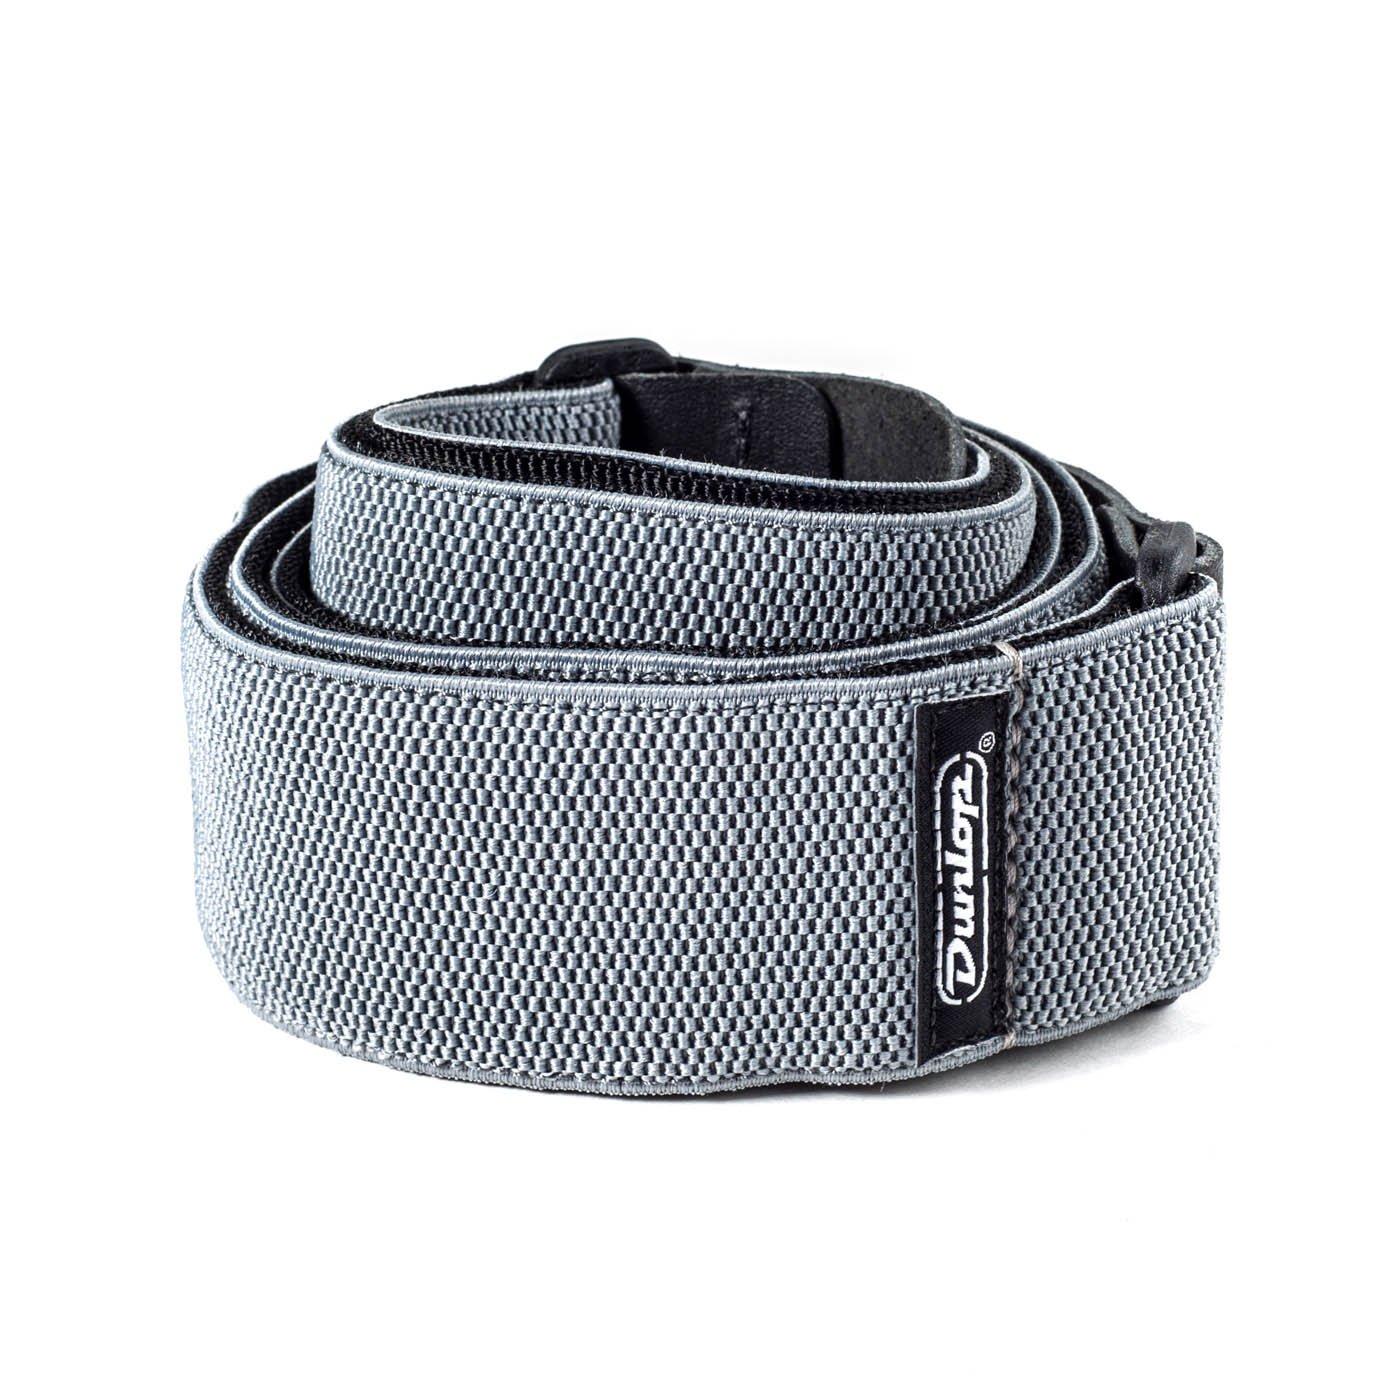 Dunlop D69-01GY Mesh Strap - Steel Gray